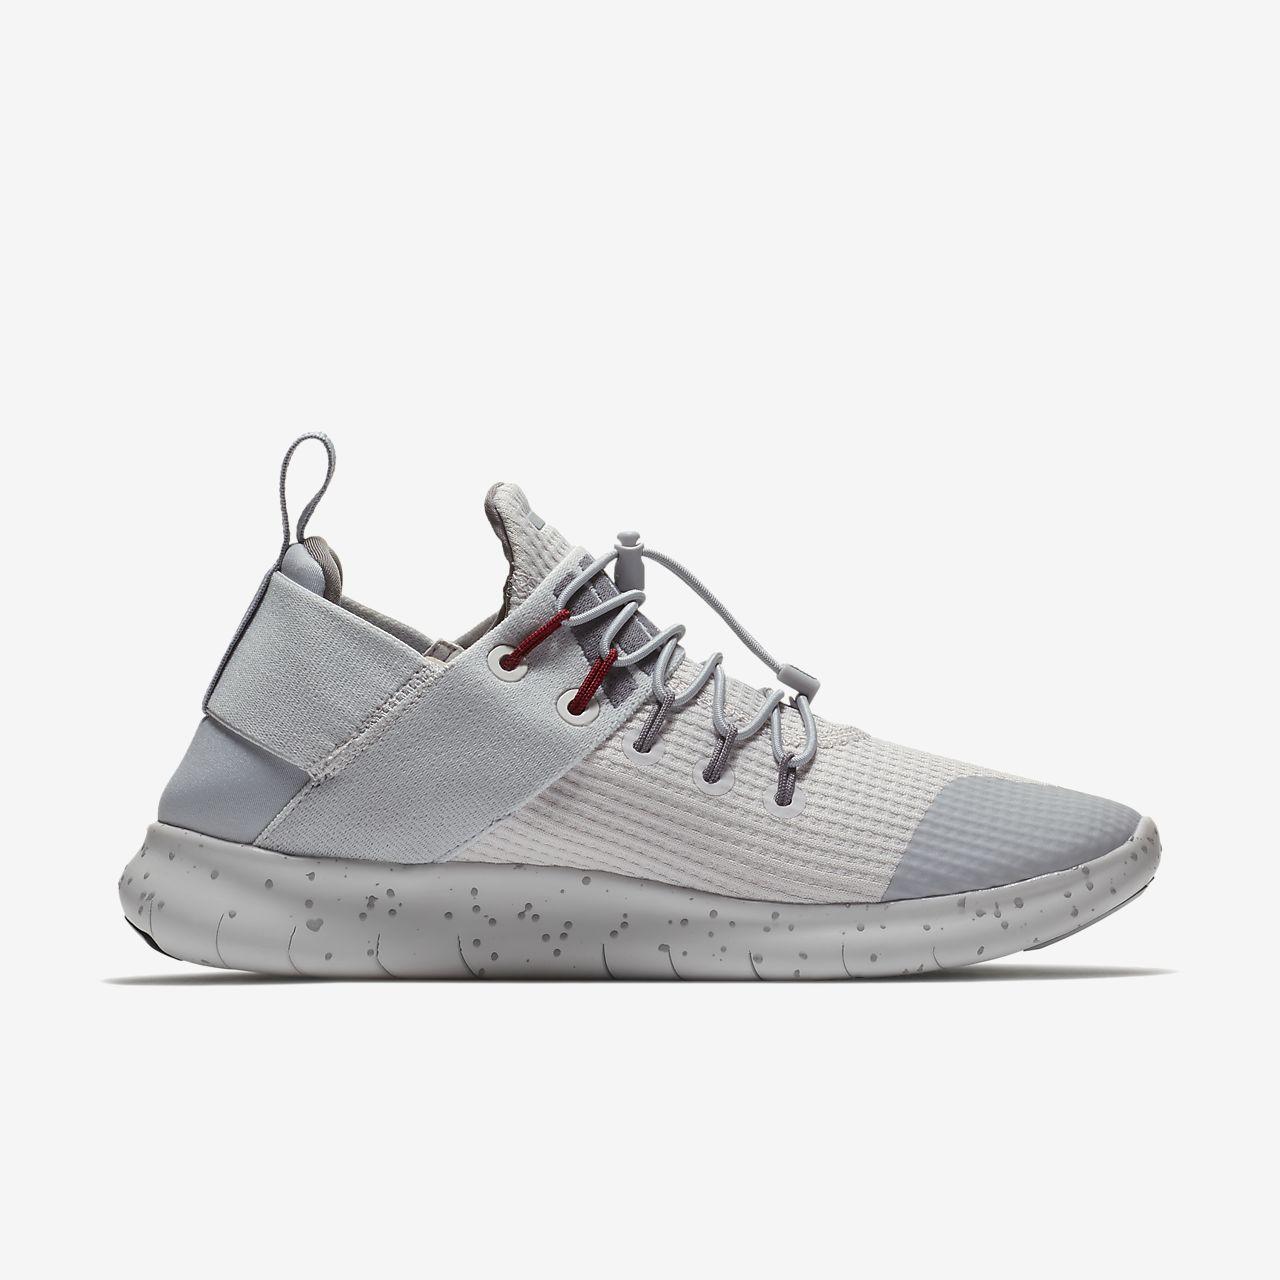 ... Nike Free RN Commuter 2017 Utility Herren-Laufschuh